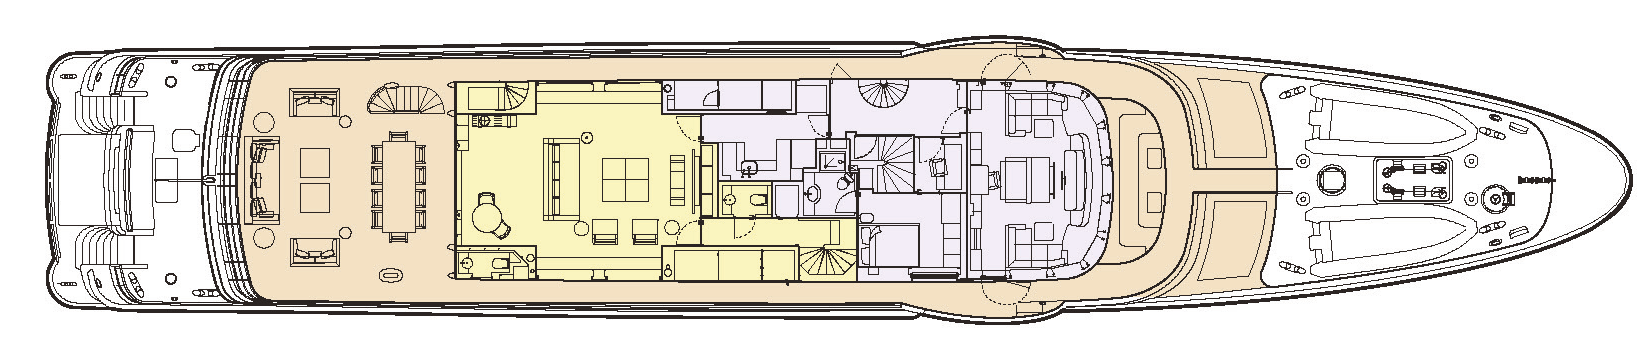 Upper Deck Ga